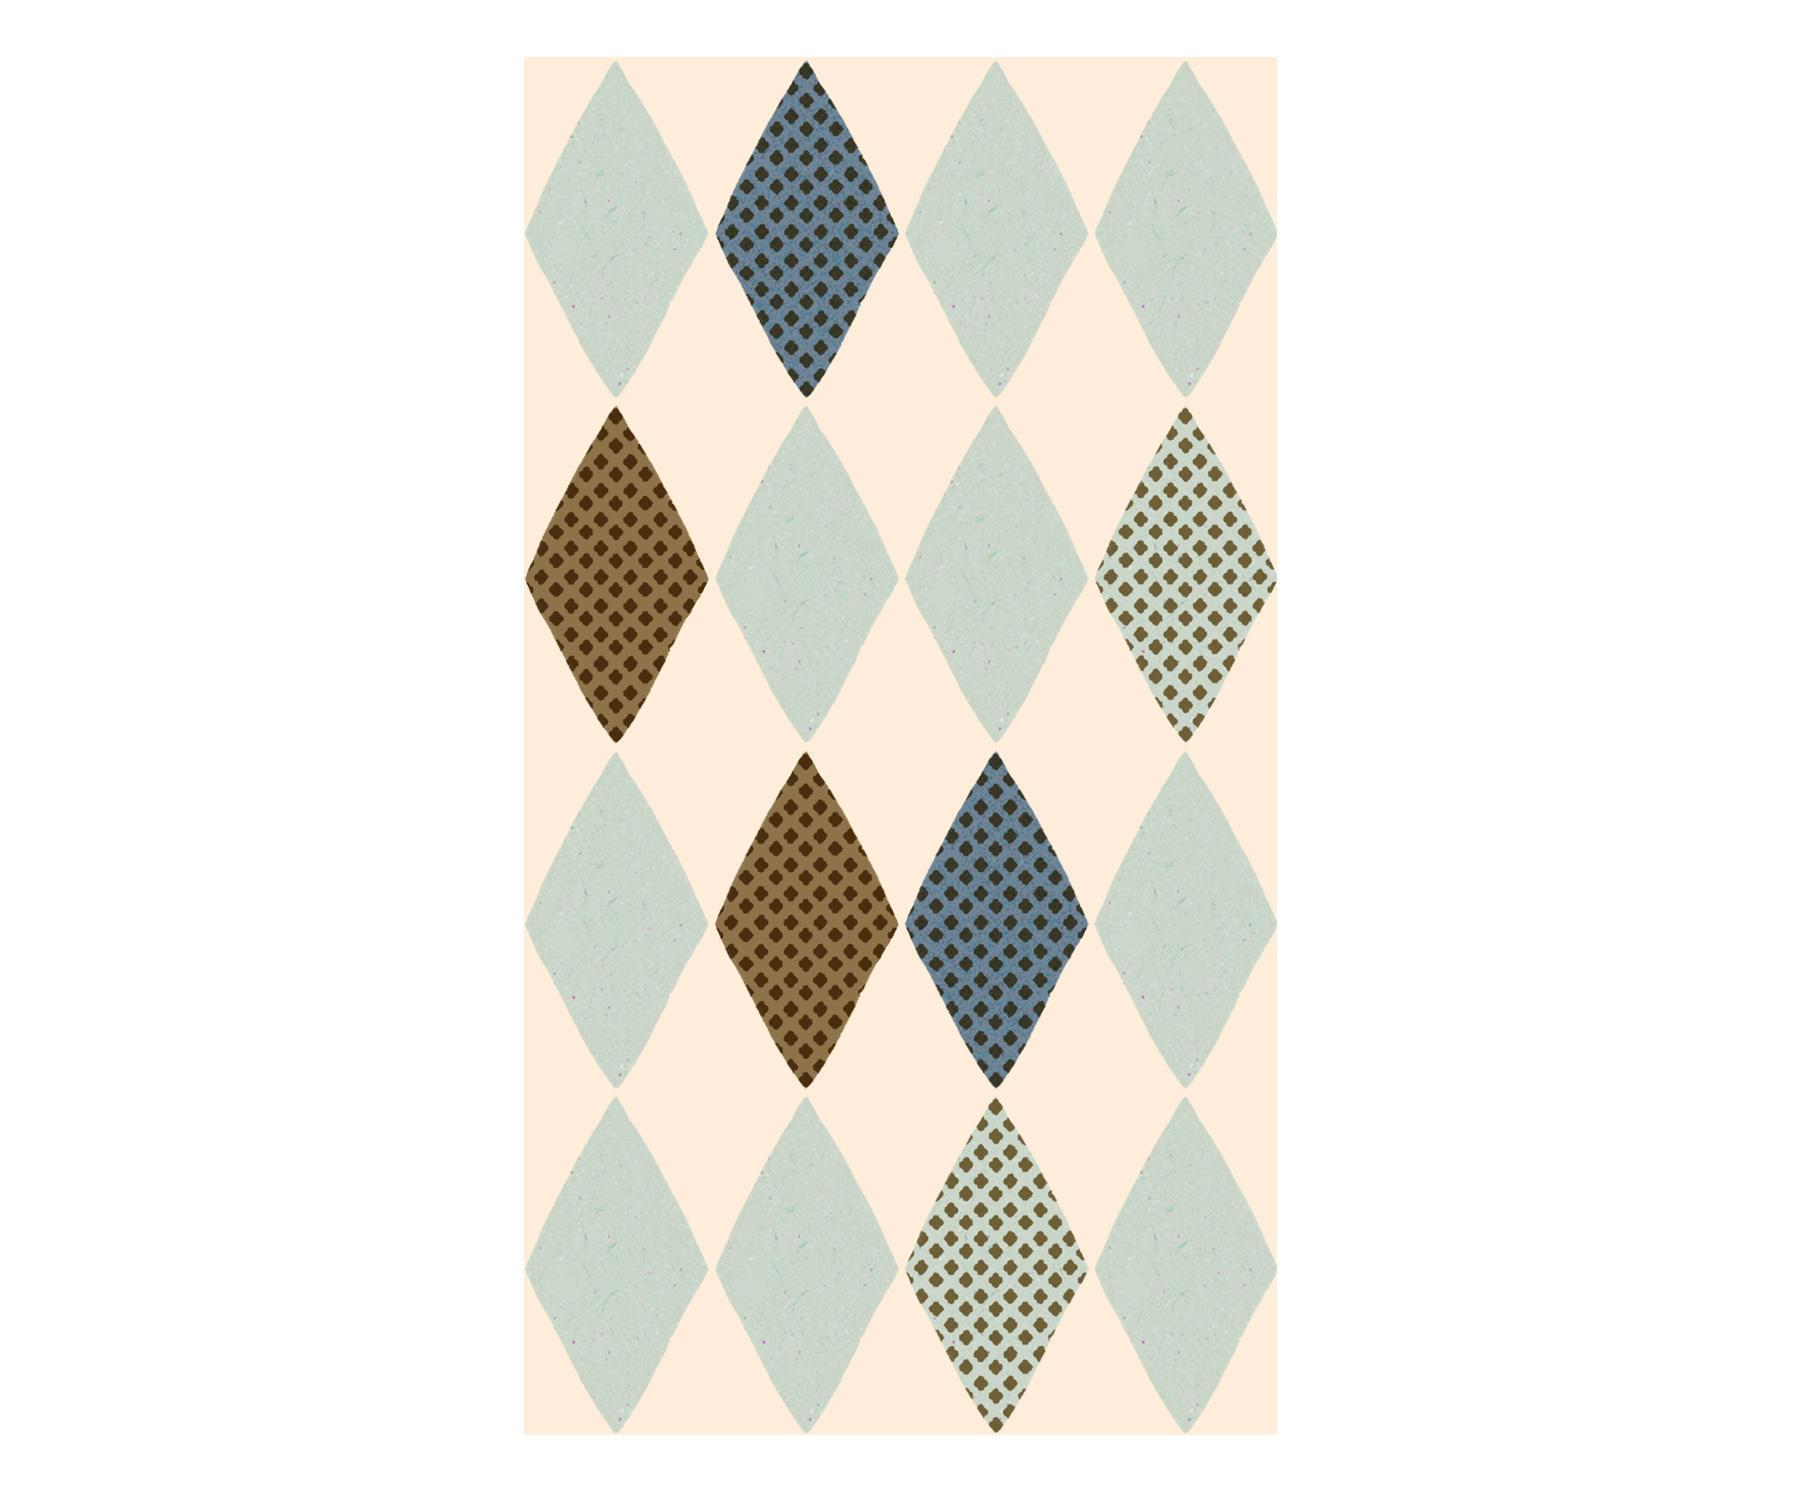 Maileg Papírové ubrousky Harlekin Blue, modrá barva, zlatá barva, papír